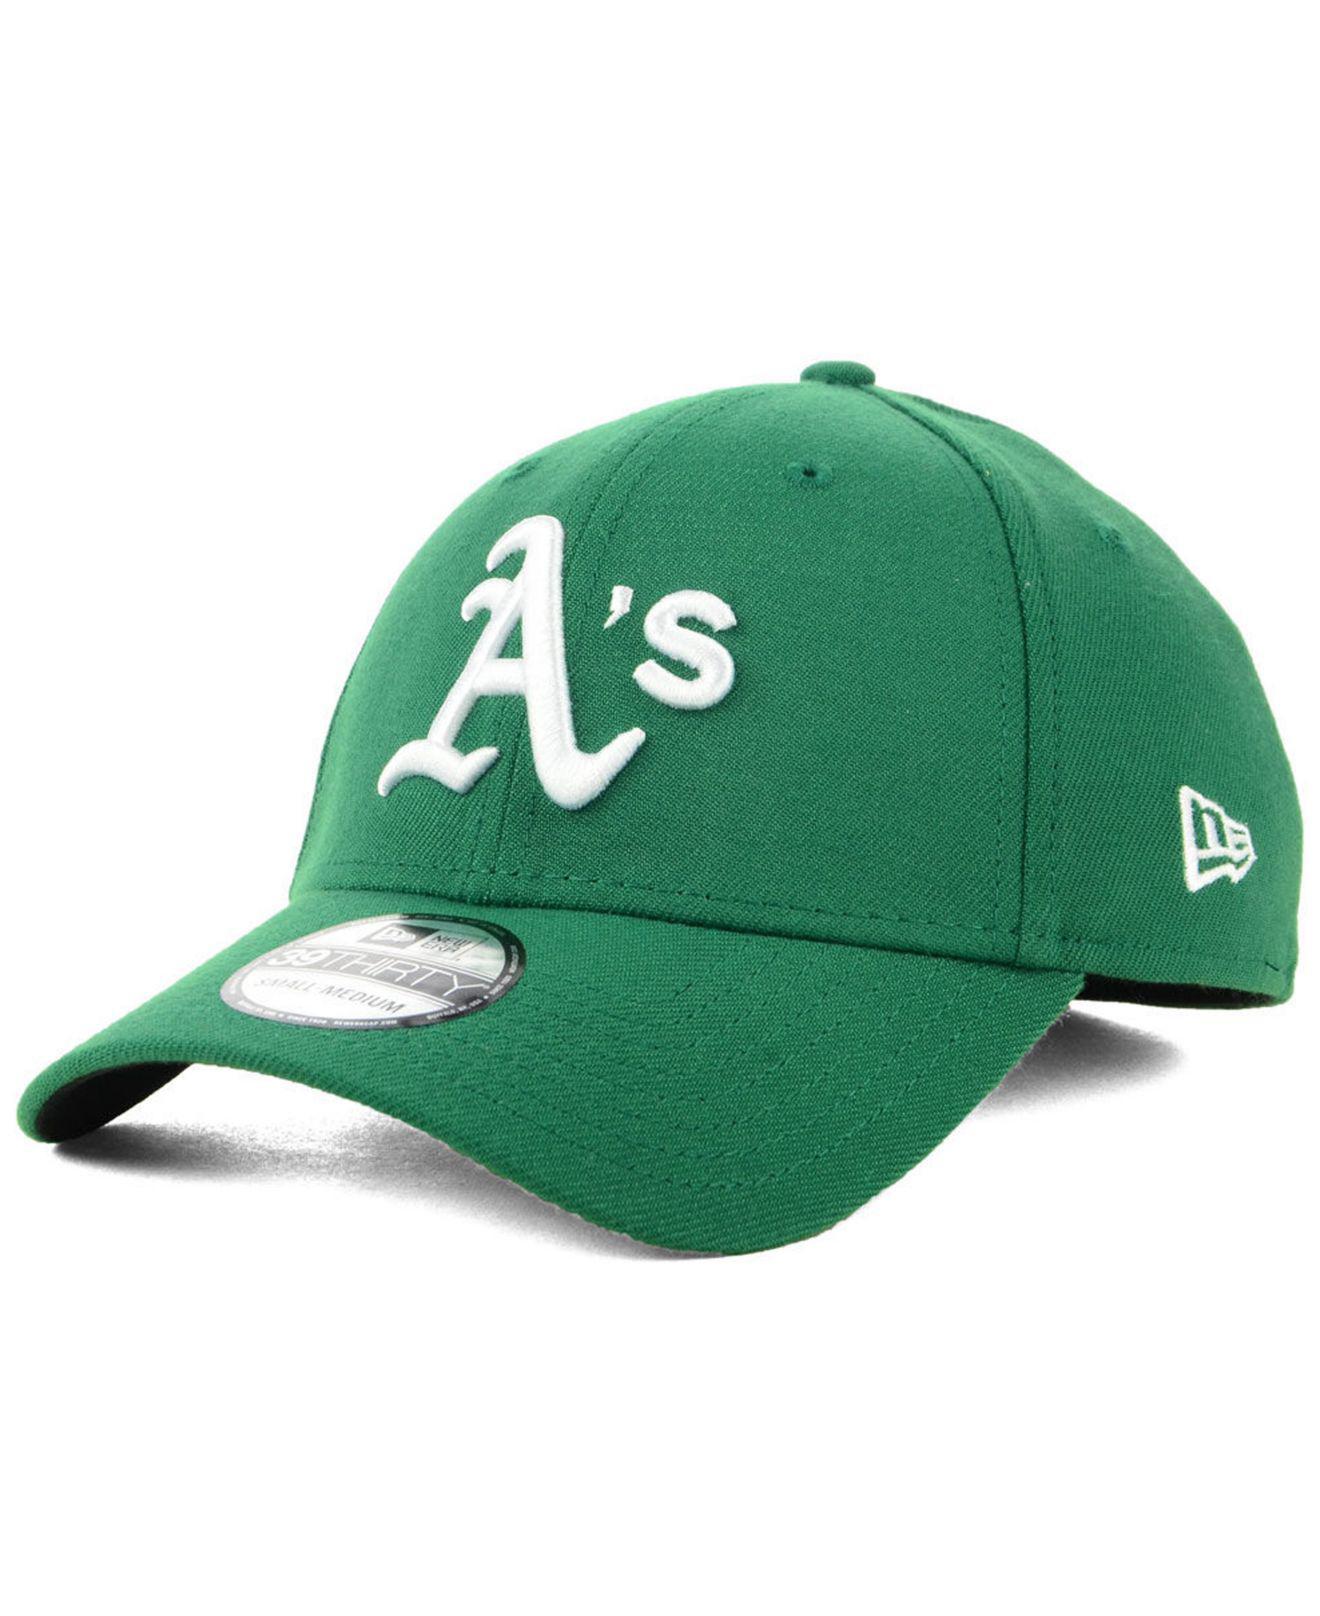 83457660fe3 KTZ Oakland Athletics Team Classic 39thirty Cap in Green for Men ...